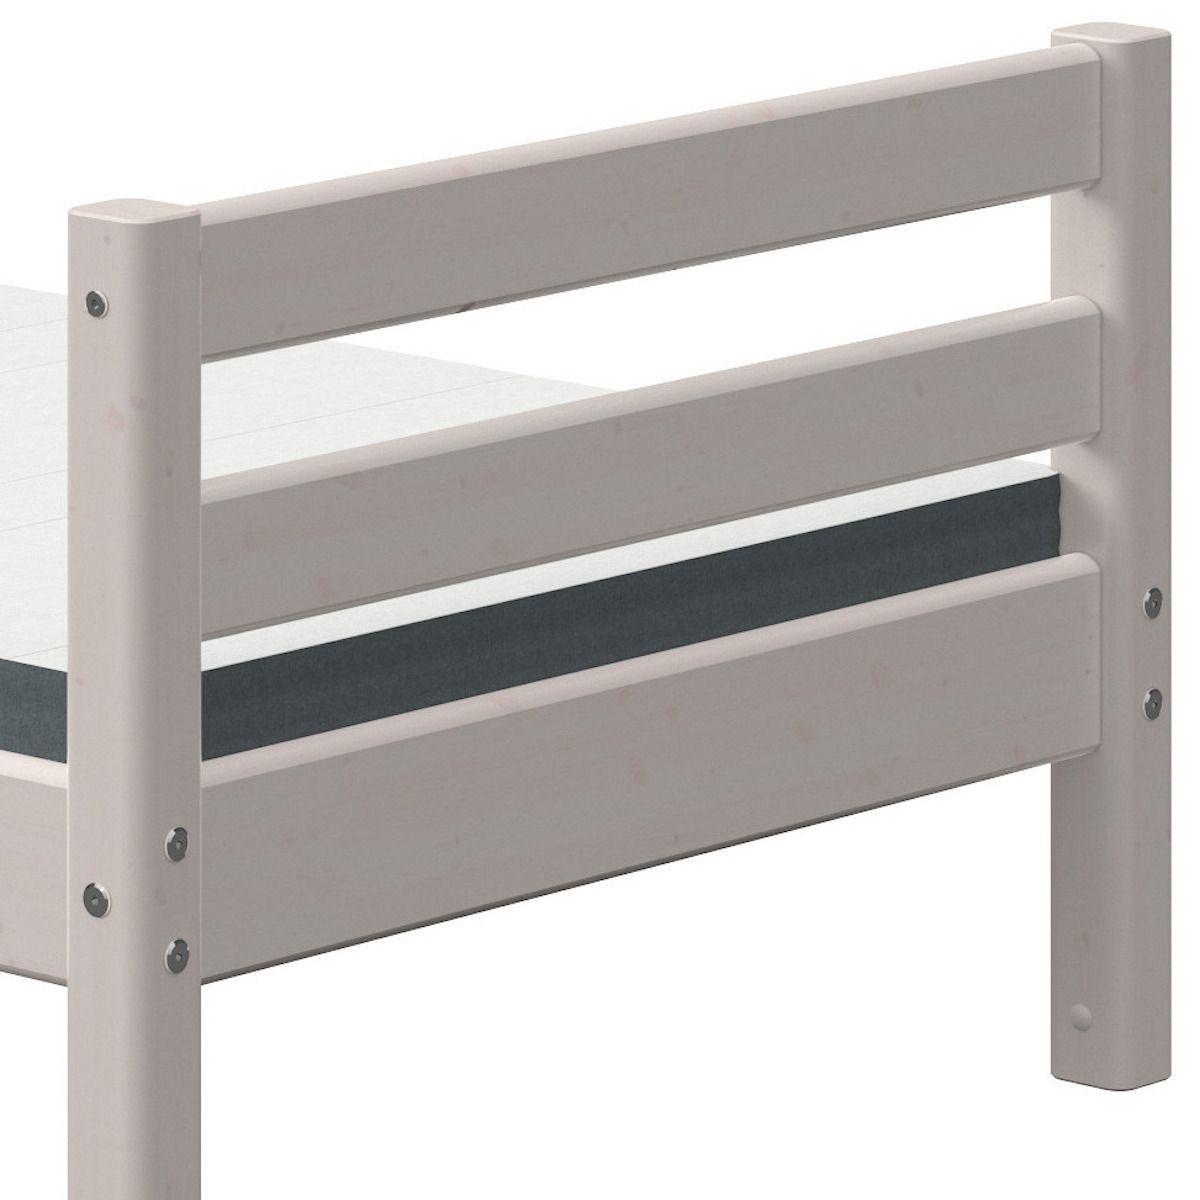 Lit 90x200cm CLASSIC Flexa grey washed